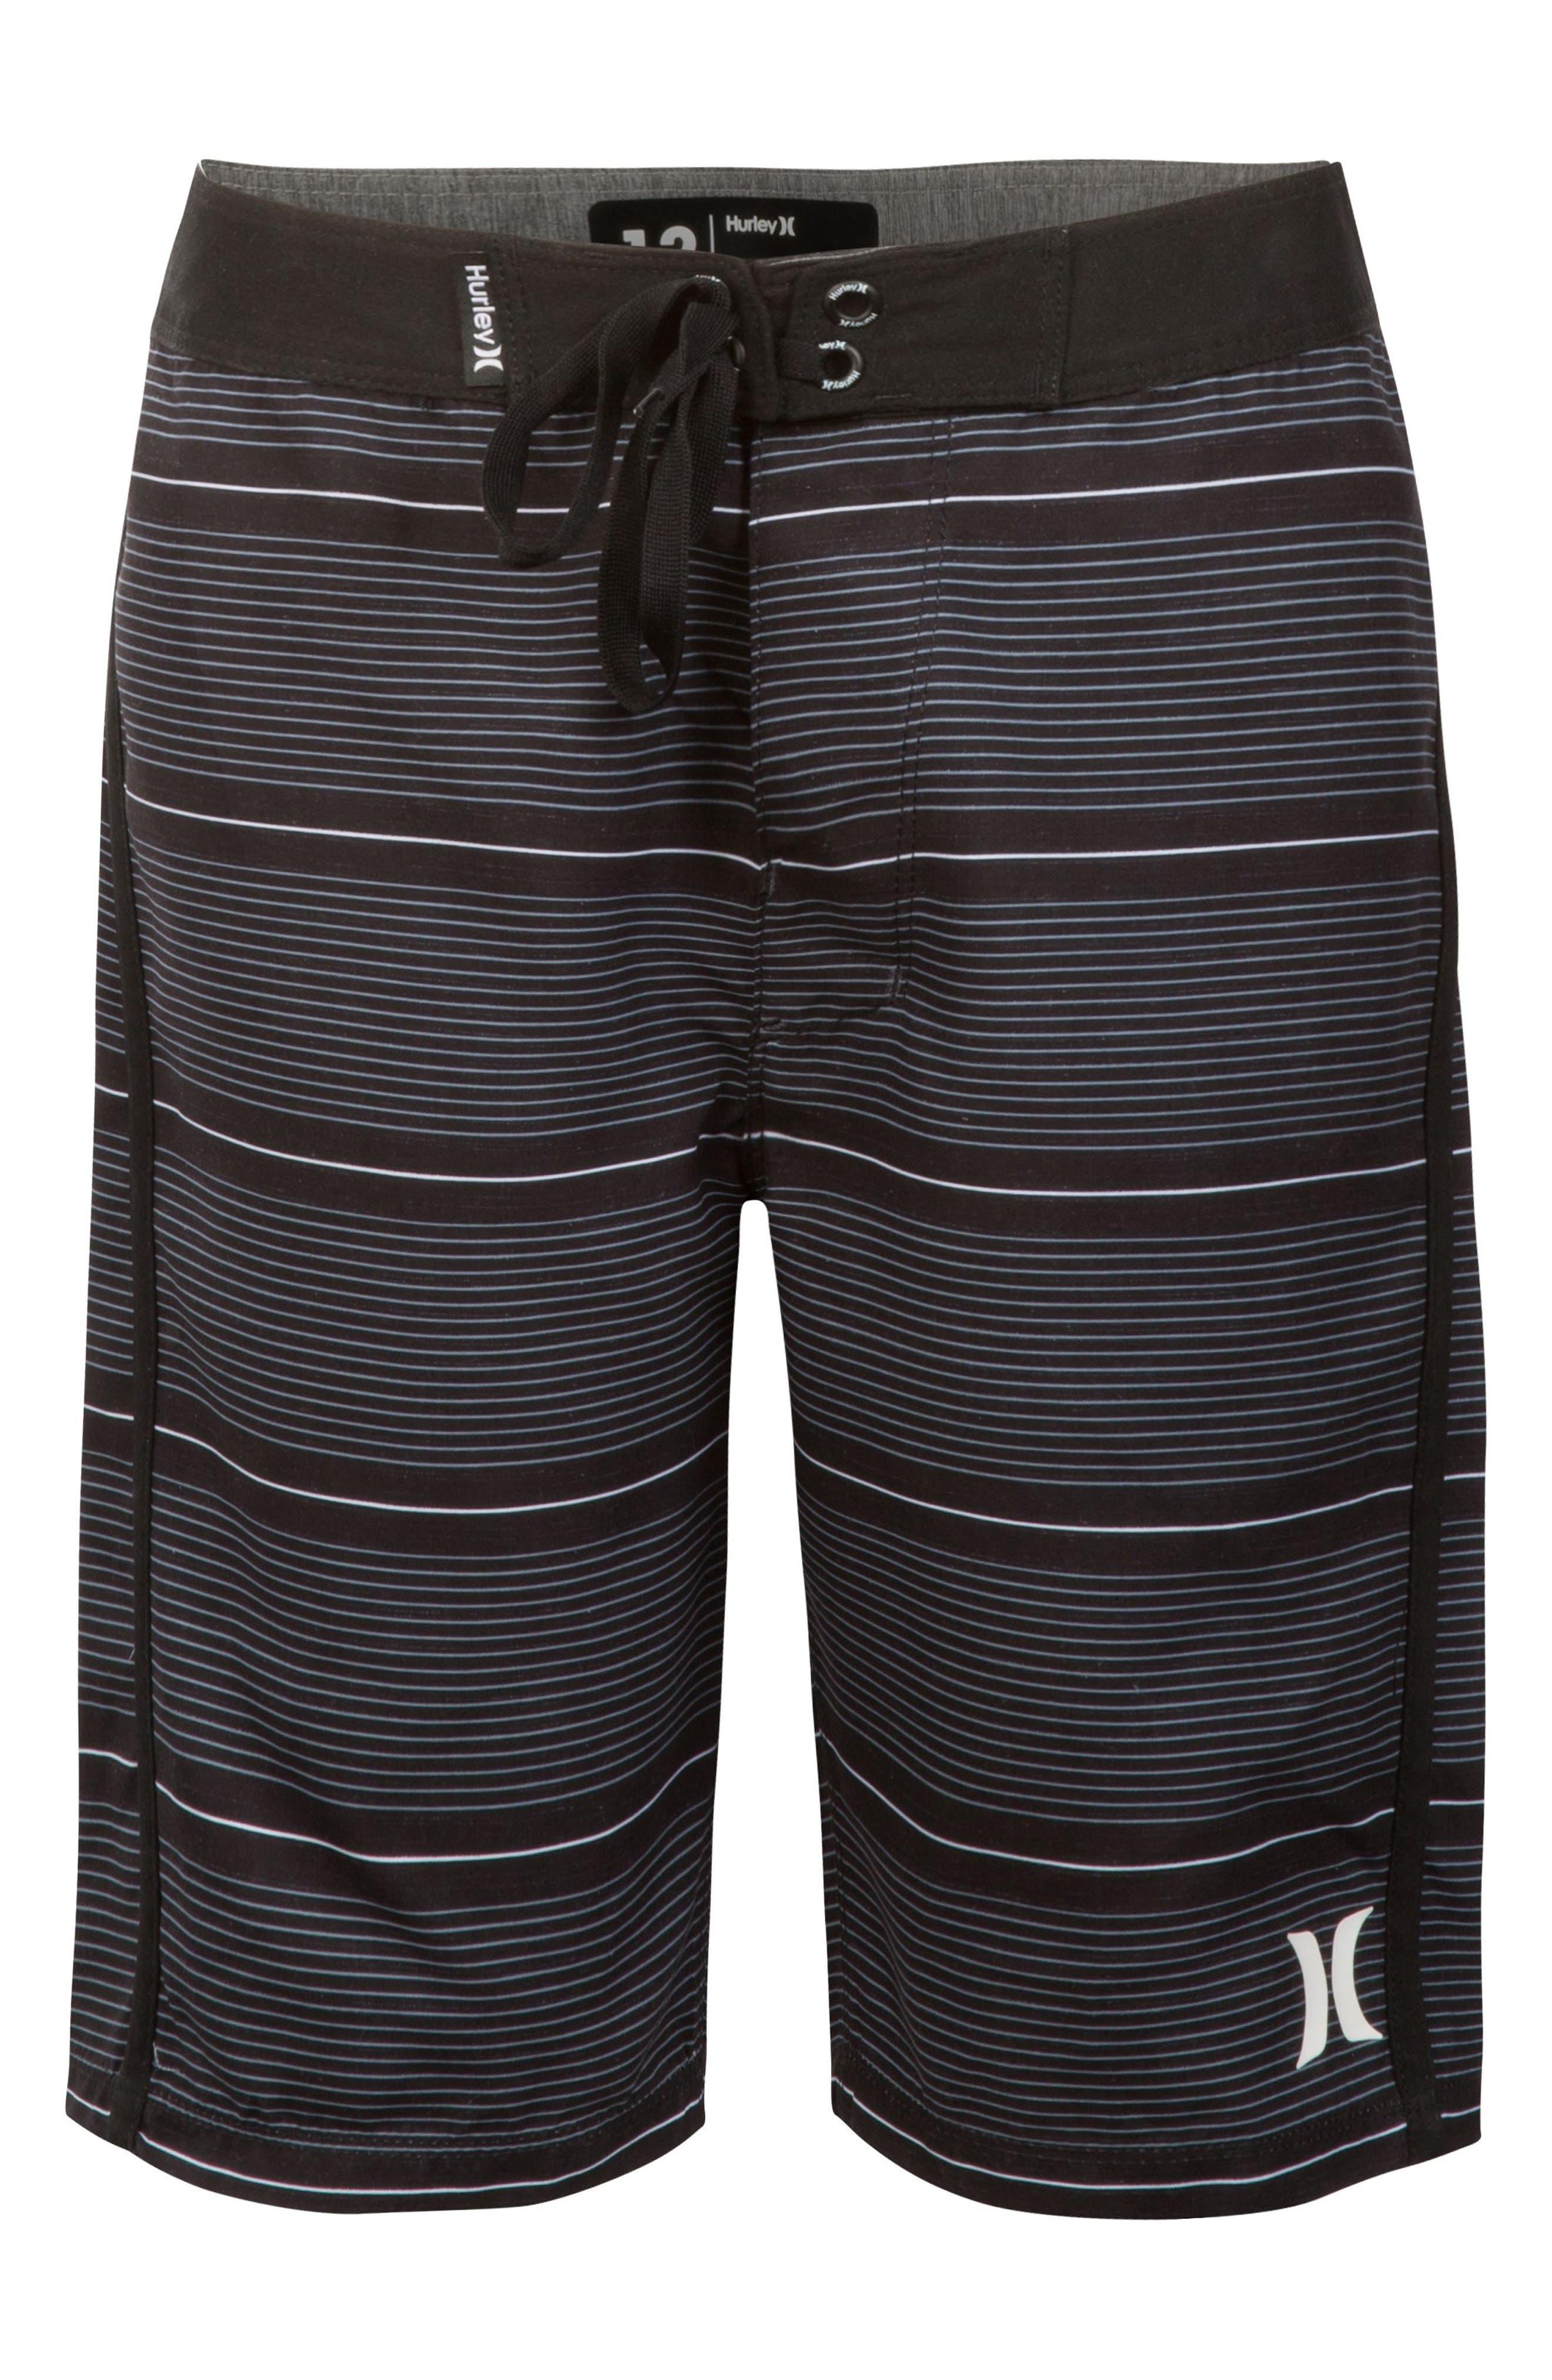 HURLEY, Shoreline Board Shorts, Main thumbnail 1, color, BLACK